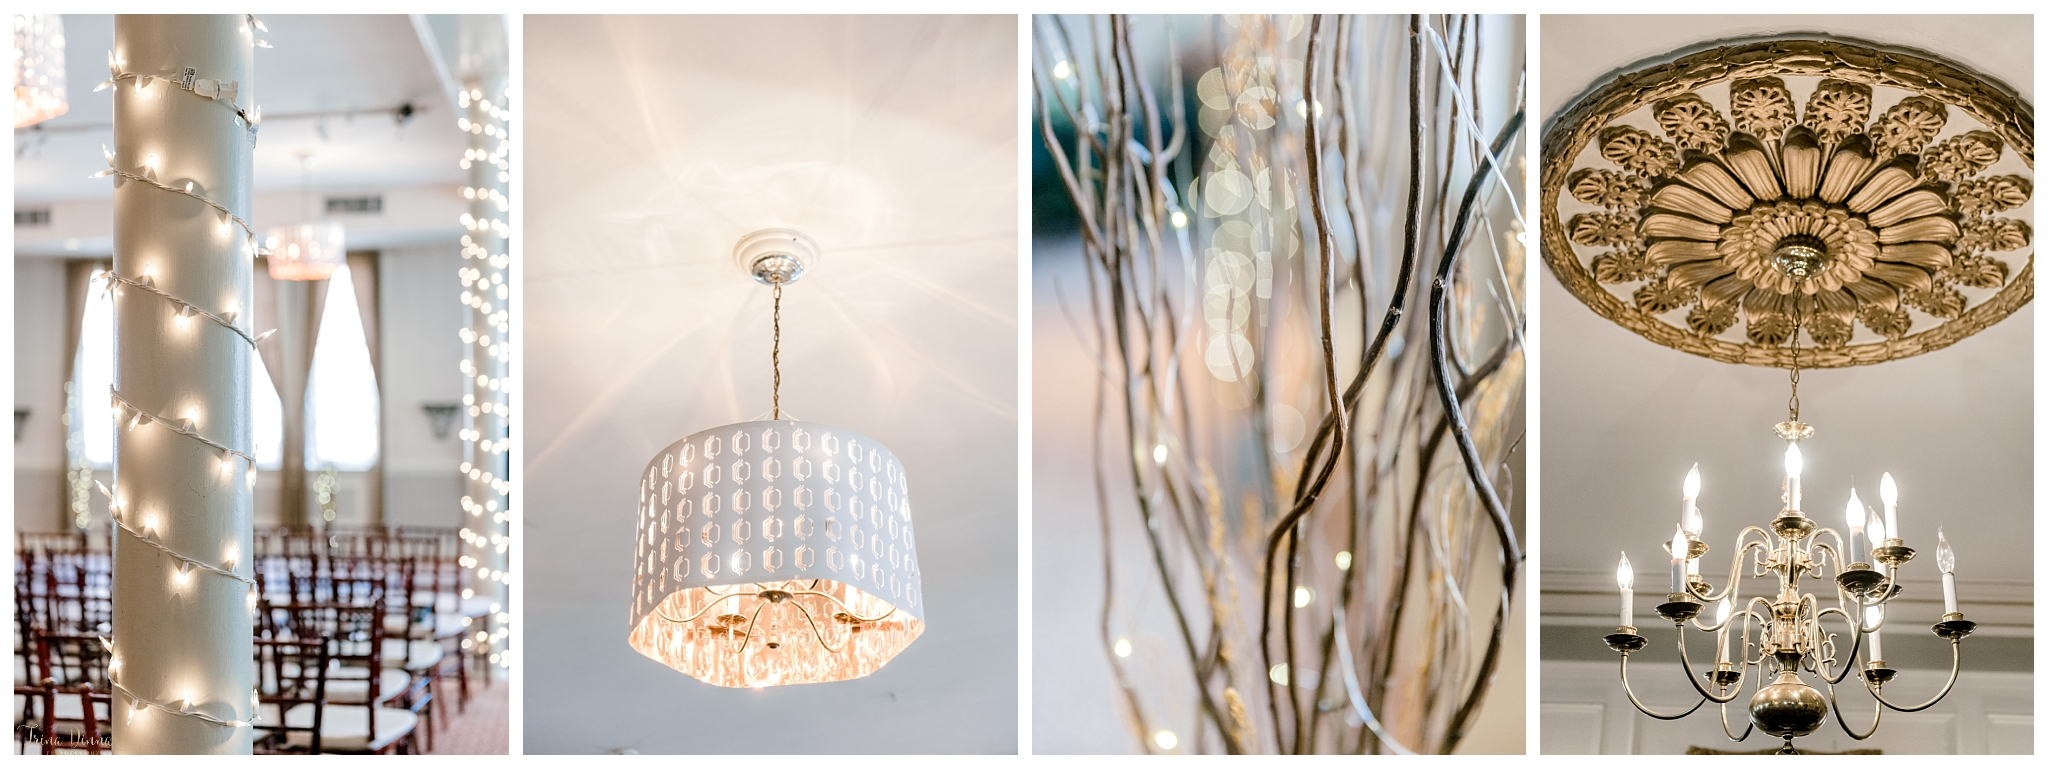 Portland Maine Wedding Reception Lighting and Decor